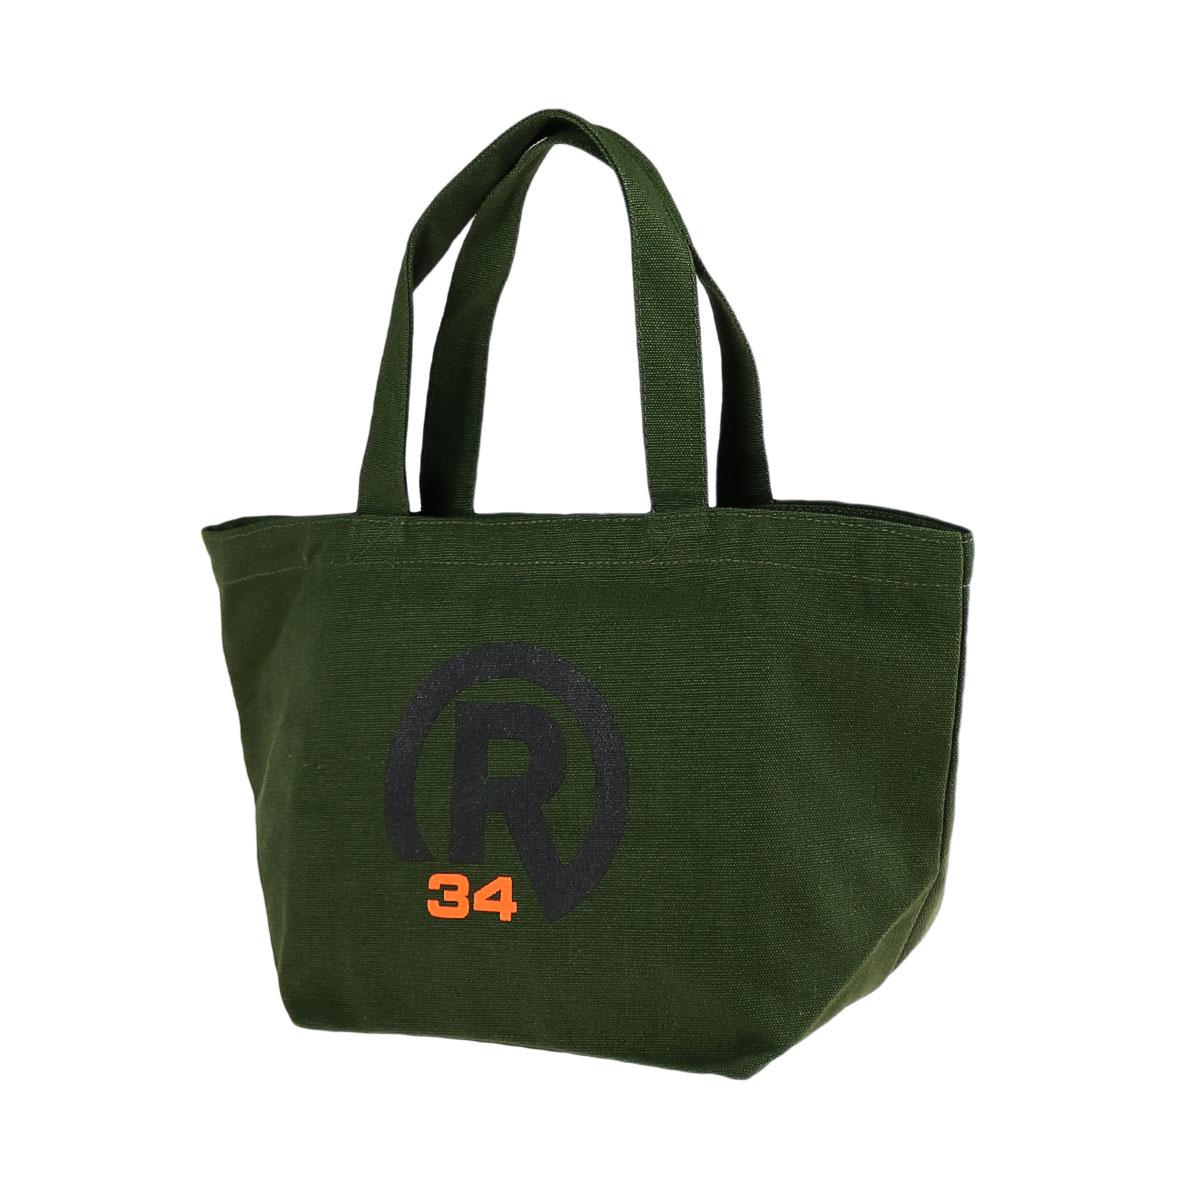 R34 BASIC LOGO LUNCH BAG